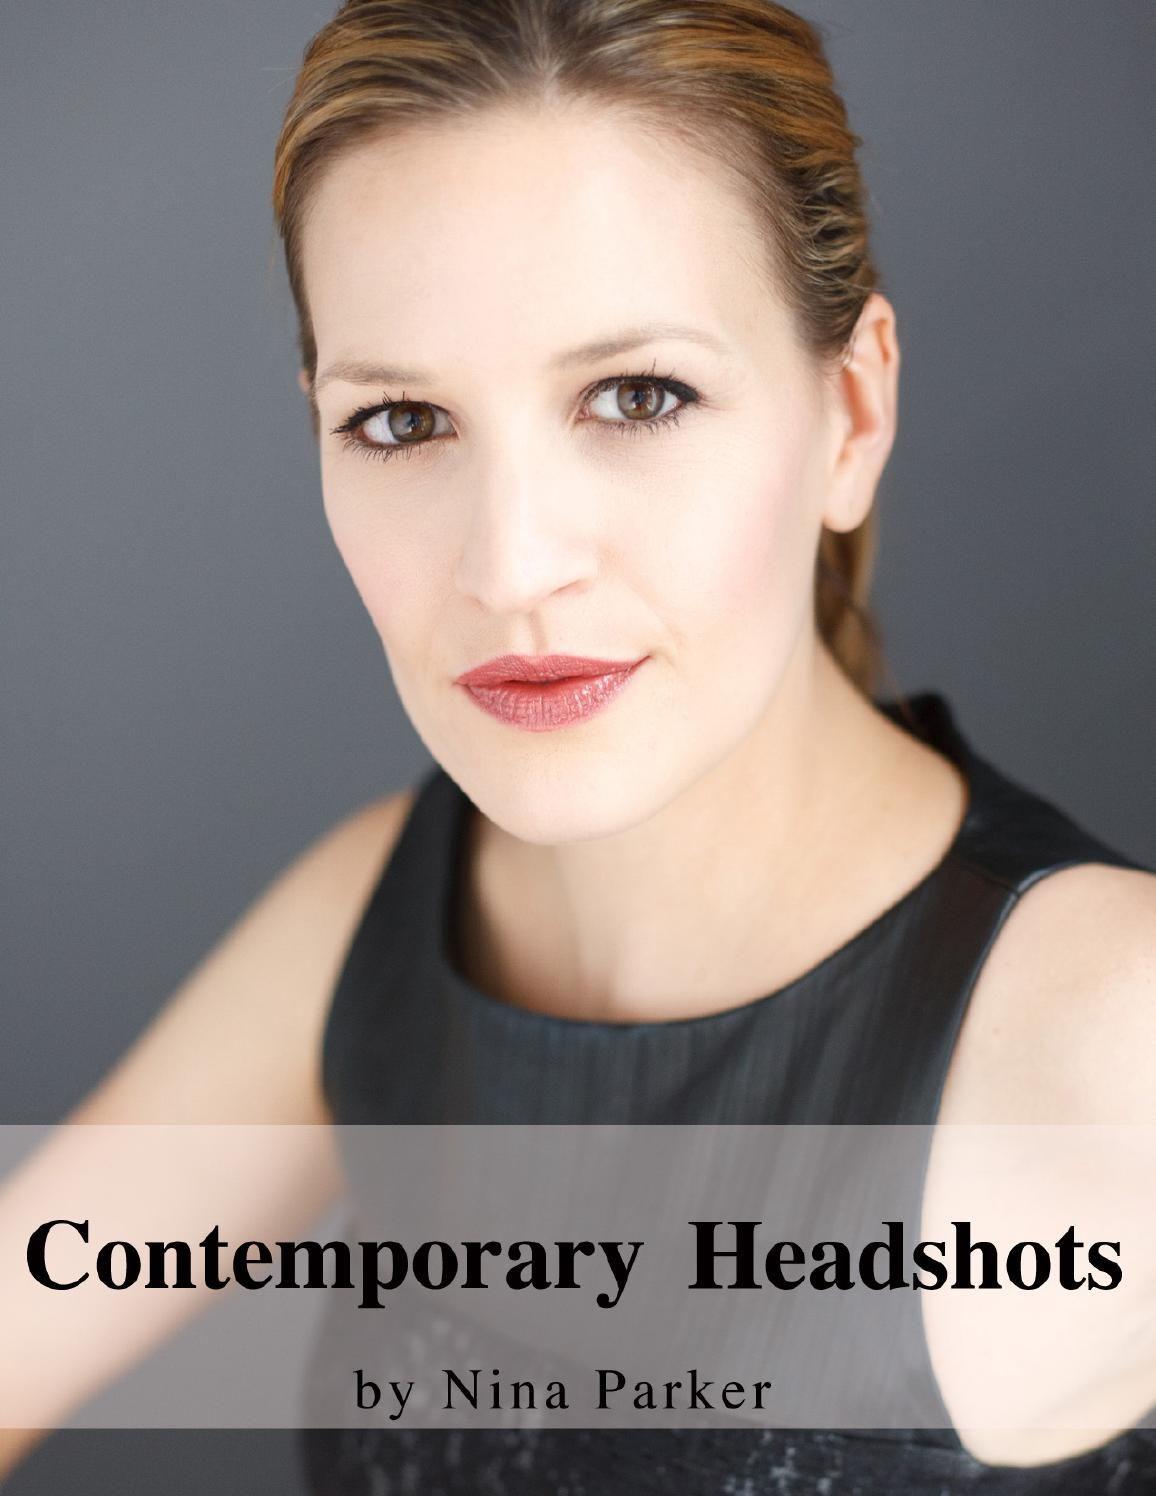 Contemporary Headshots Nina Parker Photography Studio Magazine for Contemporary, Modern Headshots from Nina Parker Photography in Atlanta, GA.